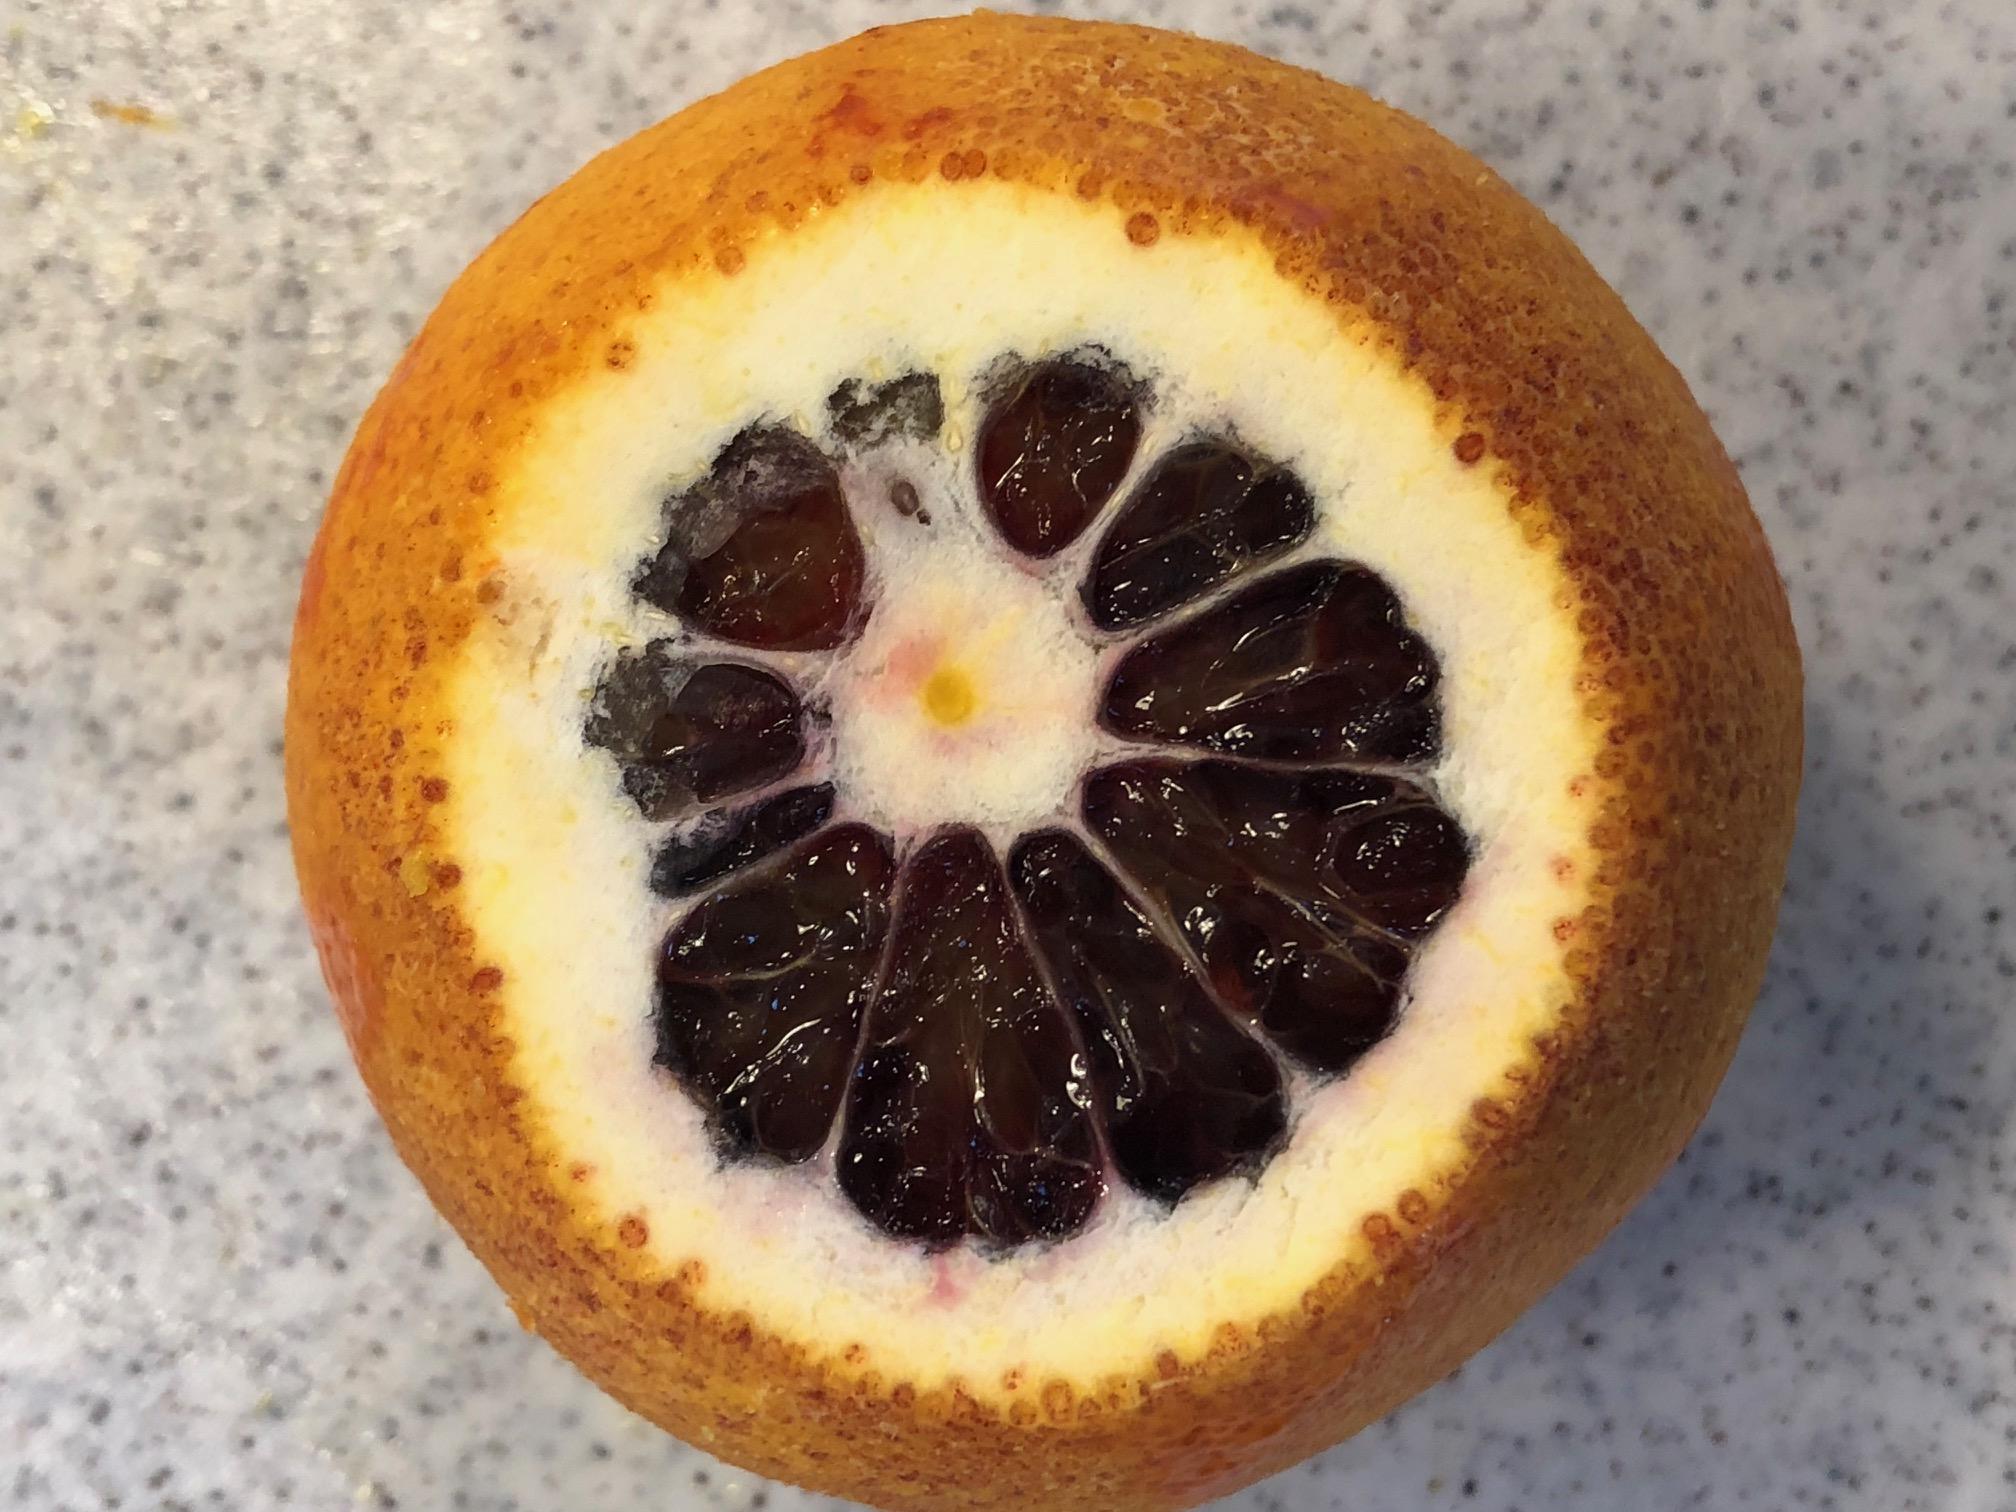 Slice off each end of the orange.